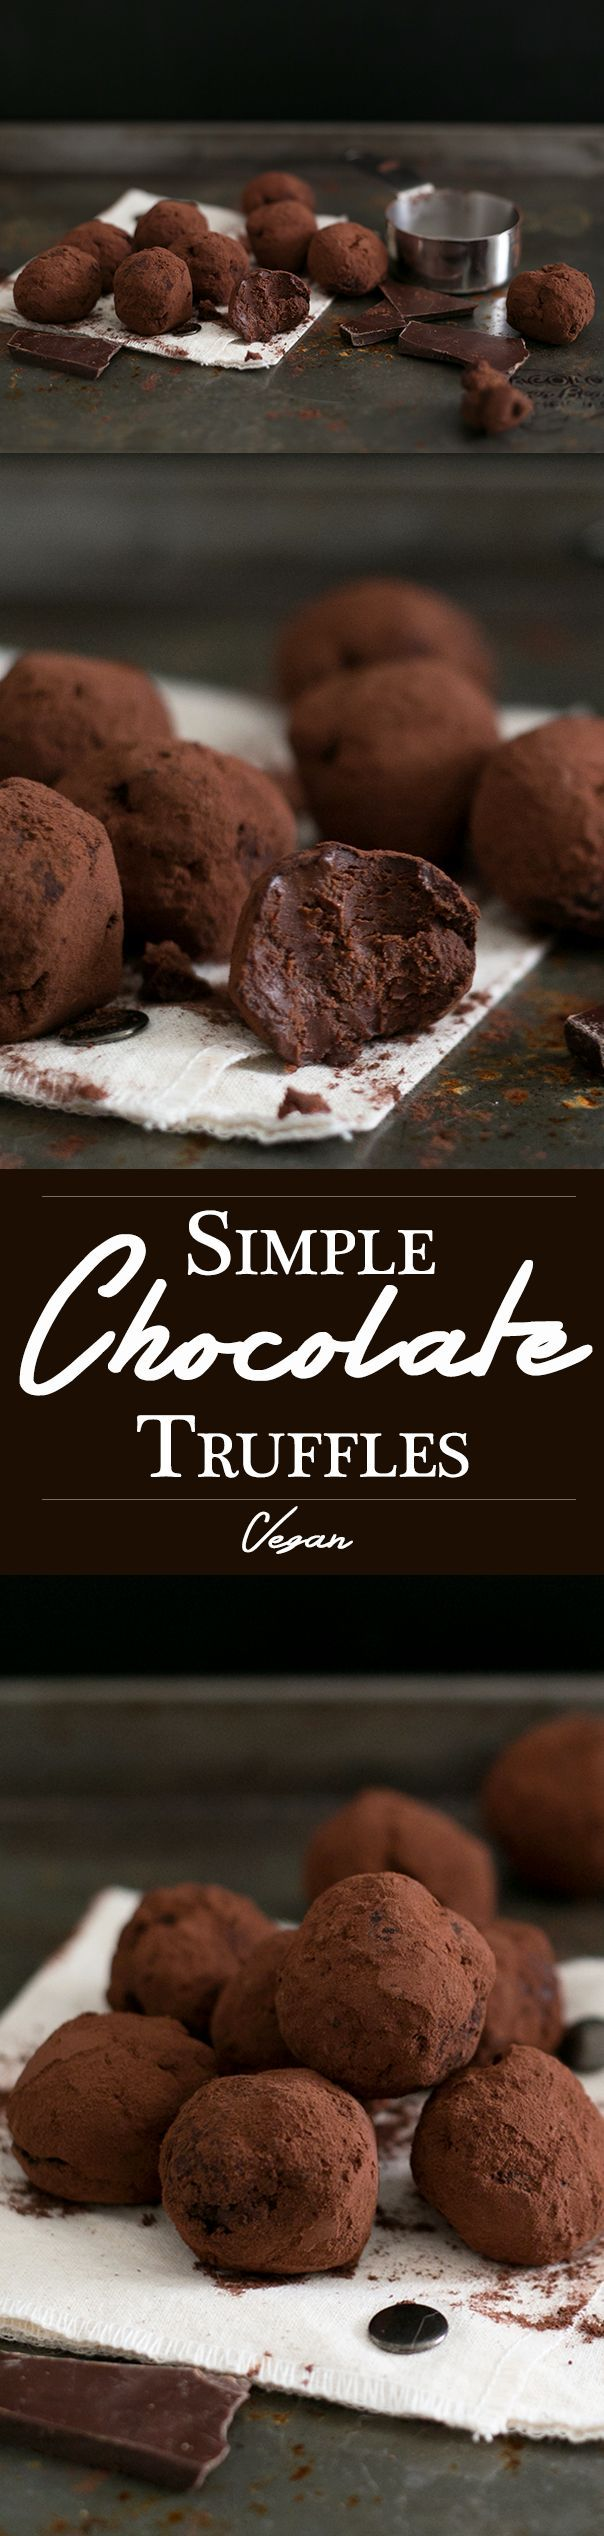 Vegan Chocolate Truffles made with Dark Chocolate, Coconut Cream, Maple Syrup Sea Salt, Espresso and Vanilla Bean.